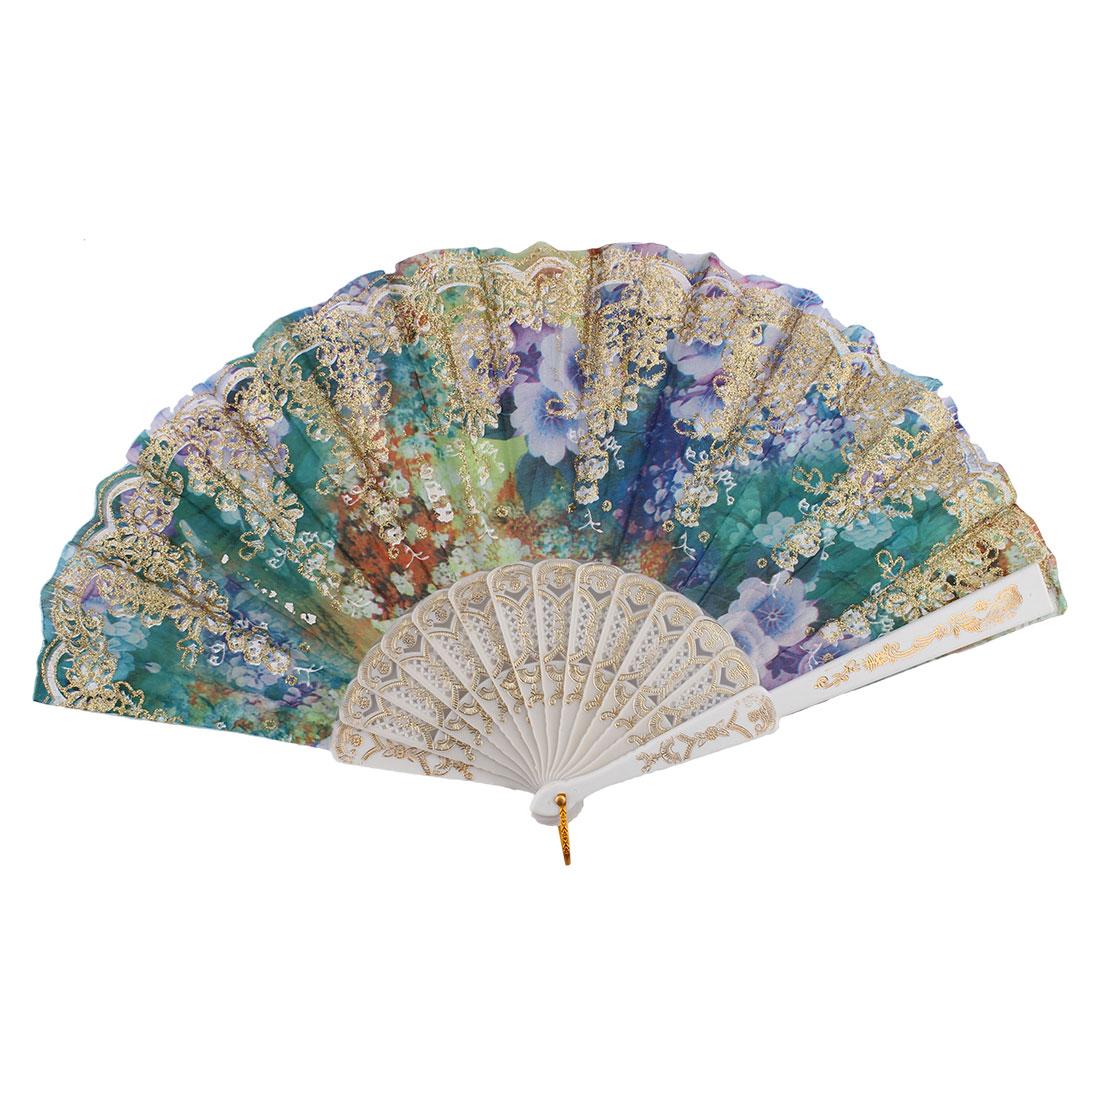 Chinese Style Glitter Powder Flower Pattern Wedding Decor Plastic Ribs Frame Nylon Fabric Folding Hand Fan